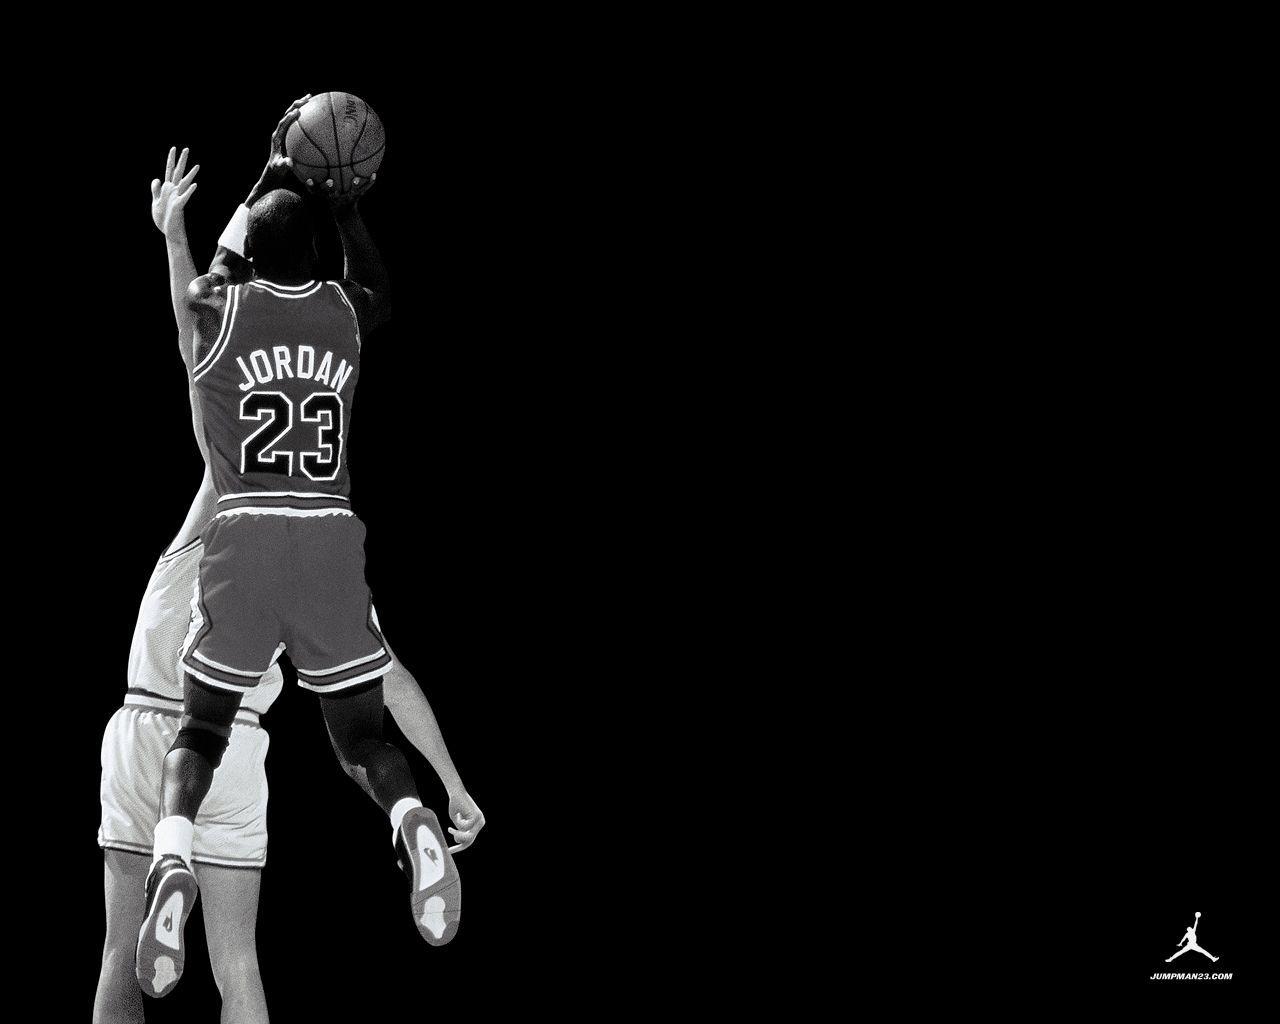 Michael Jordan Wallpaper 1080p: Best Images About Desktop Wallpapers On Pinterest Jordans